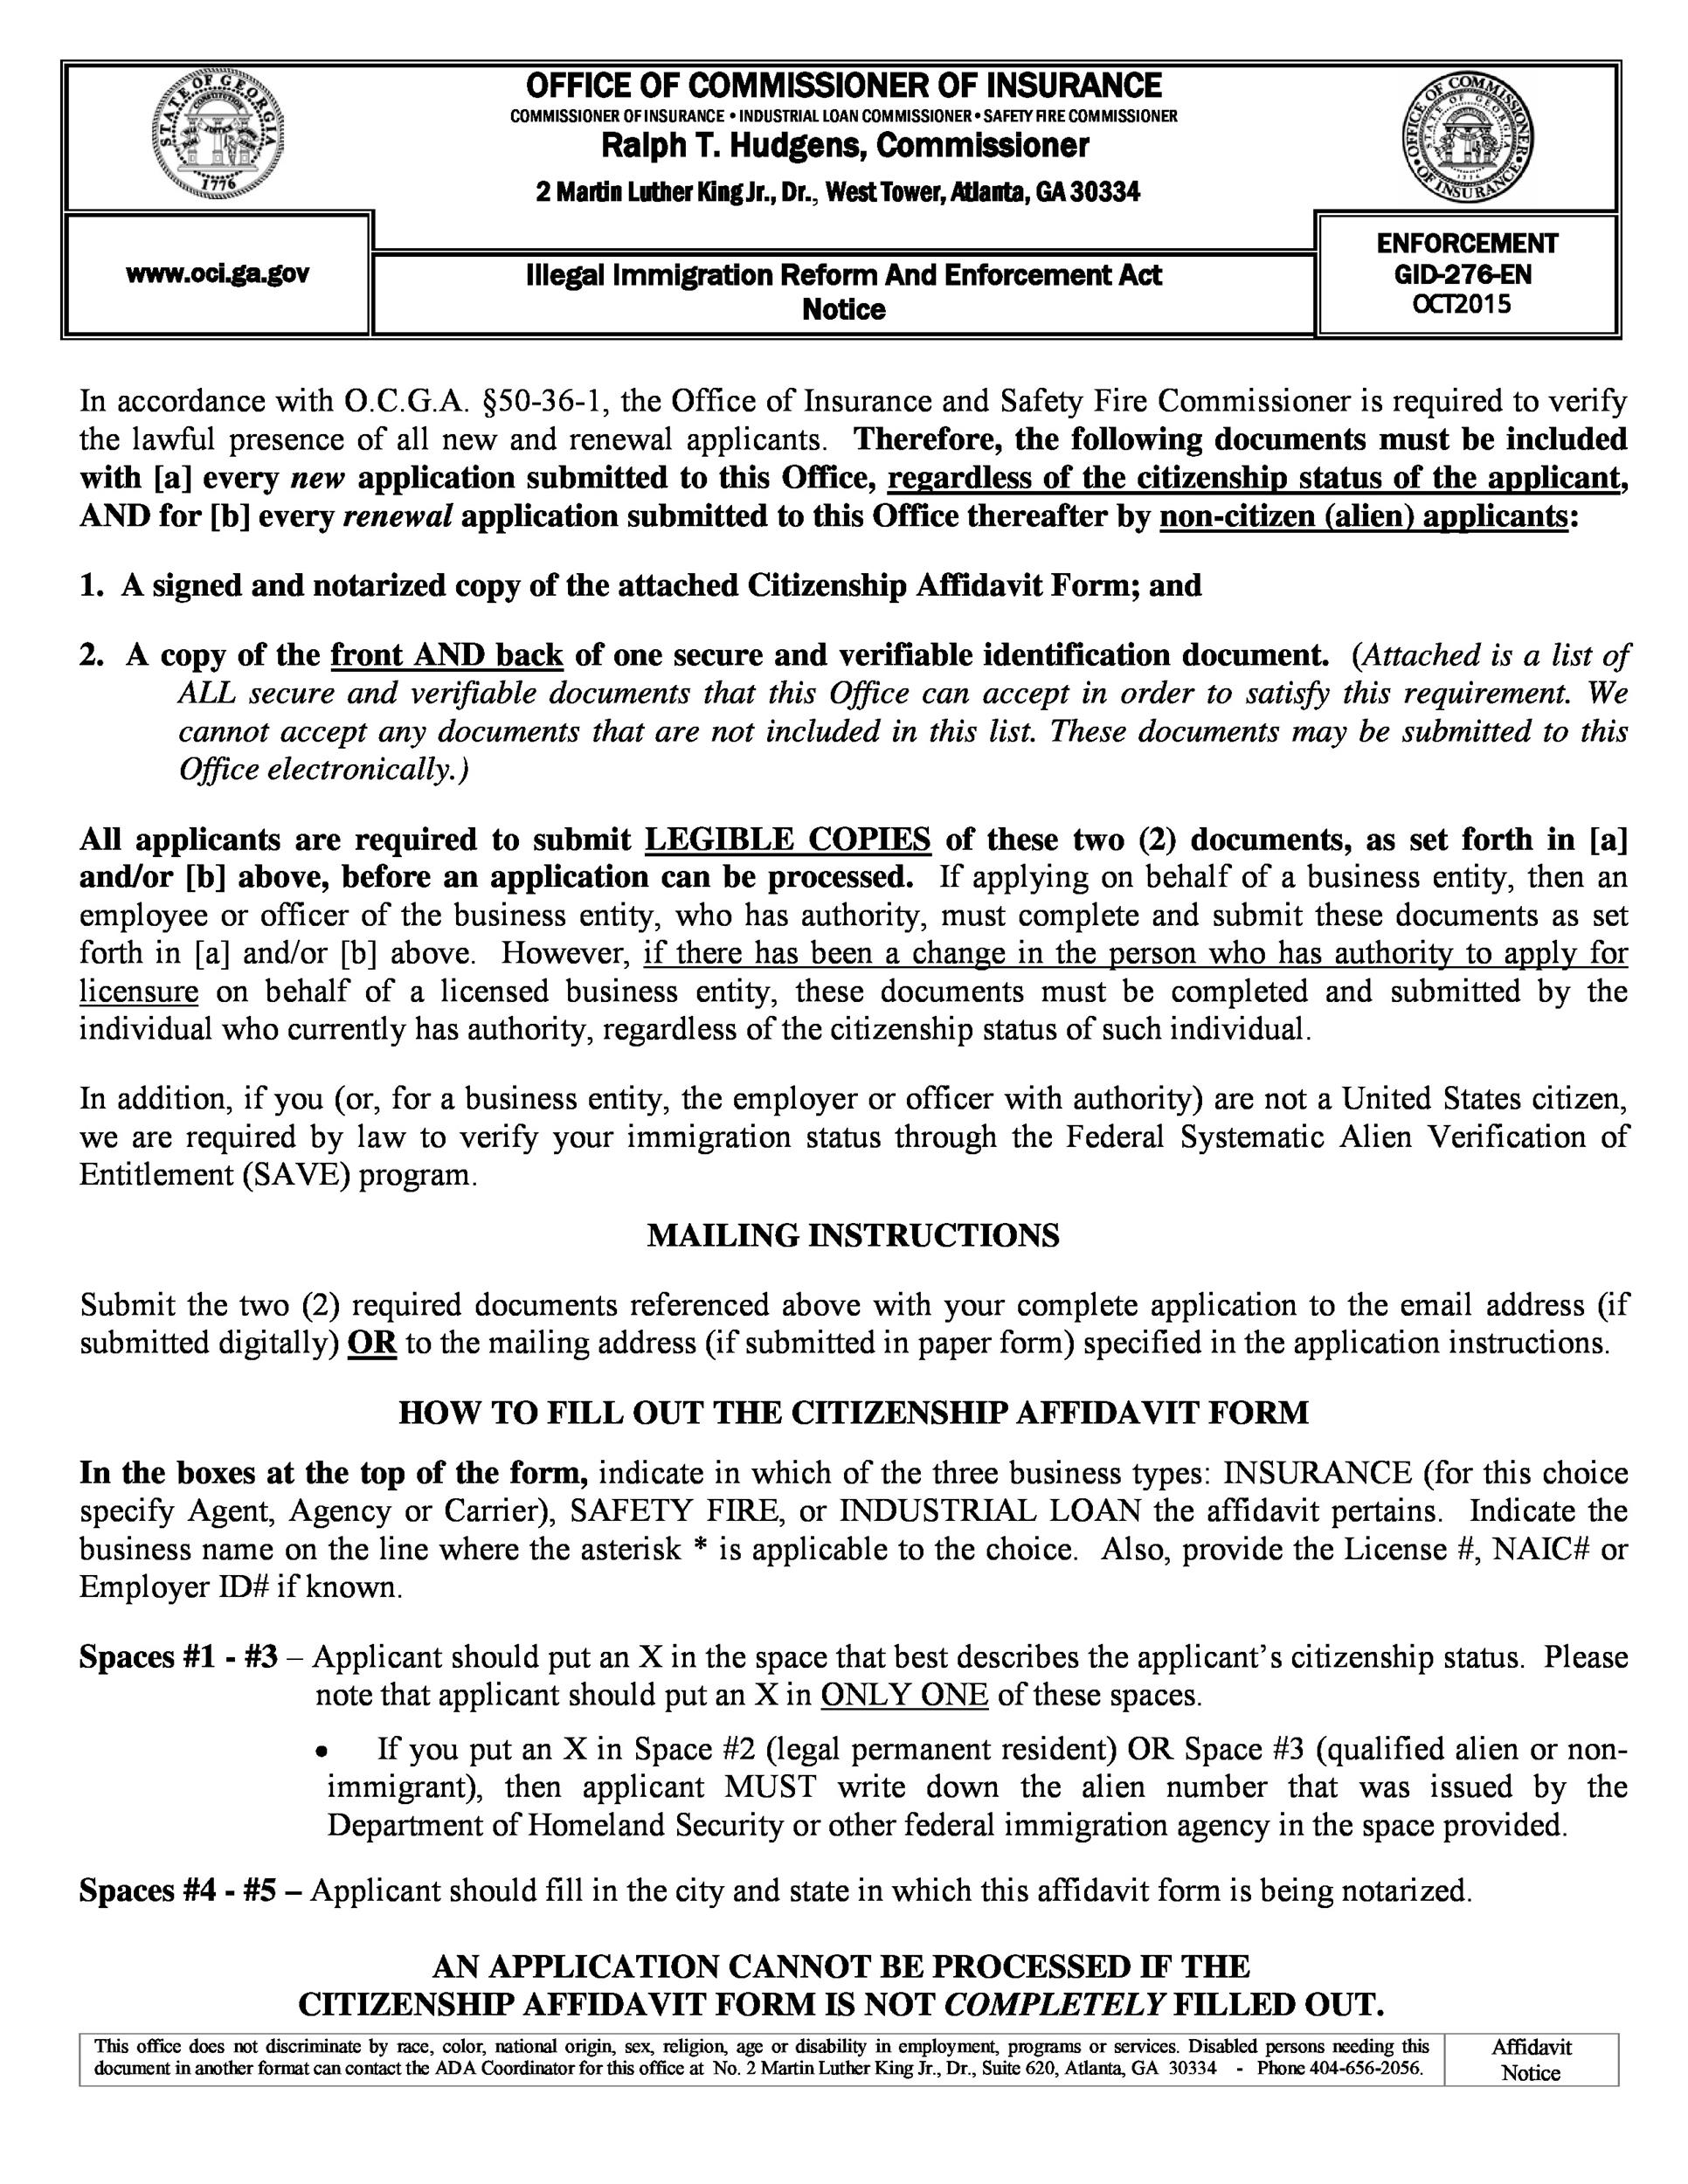 Free affidavit form 29